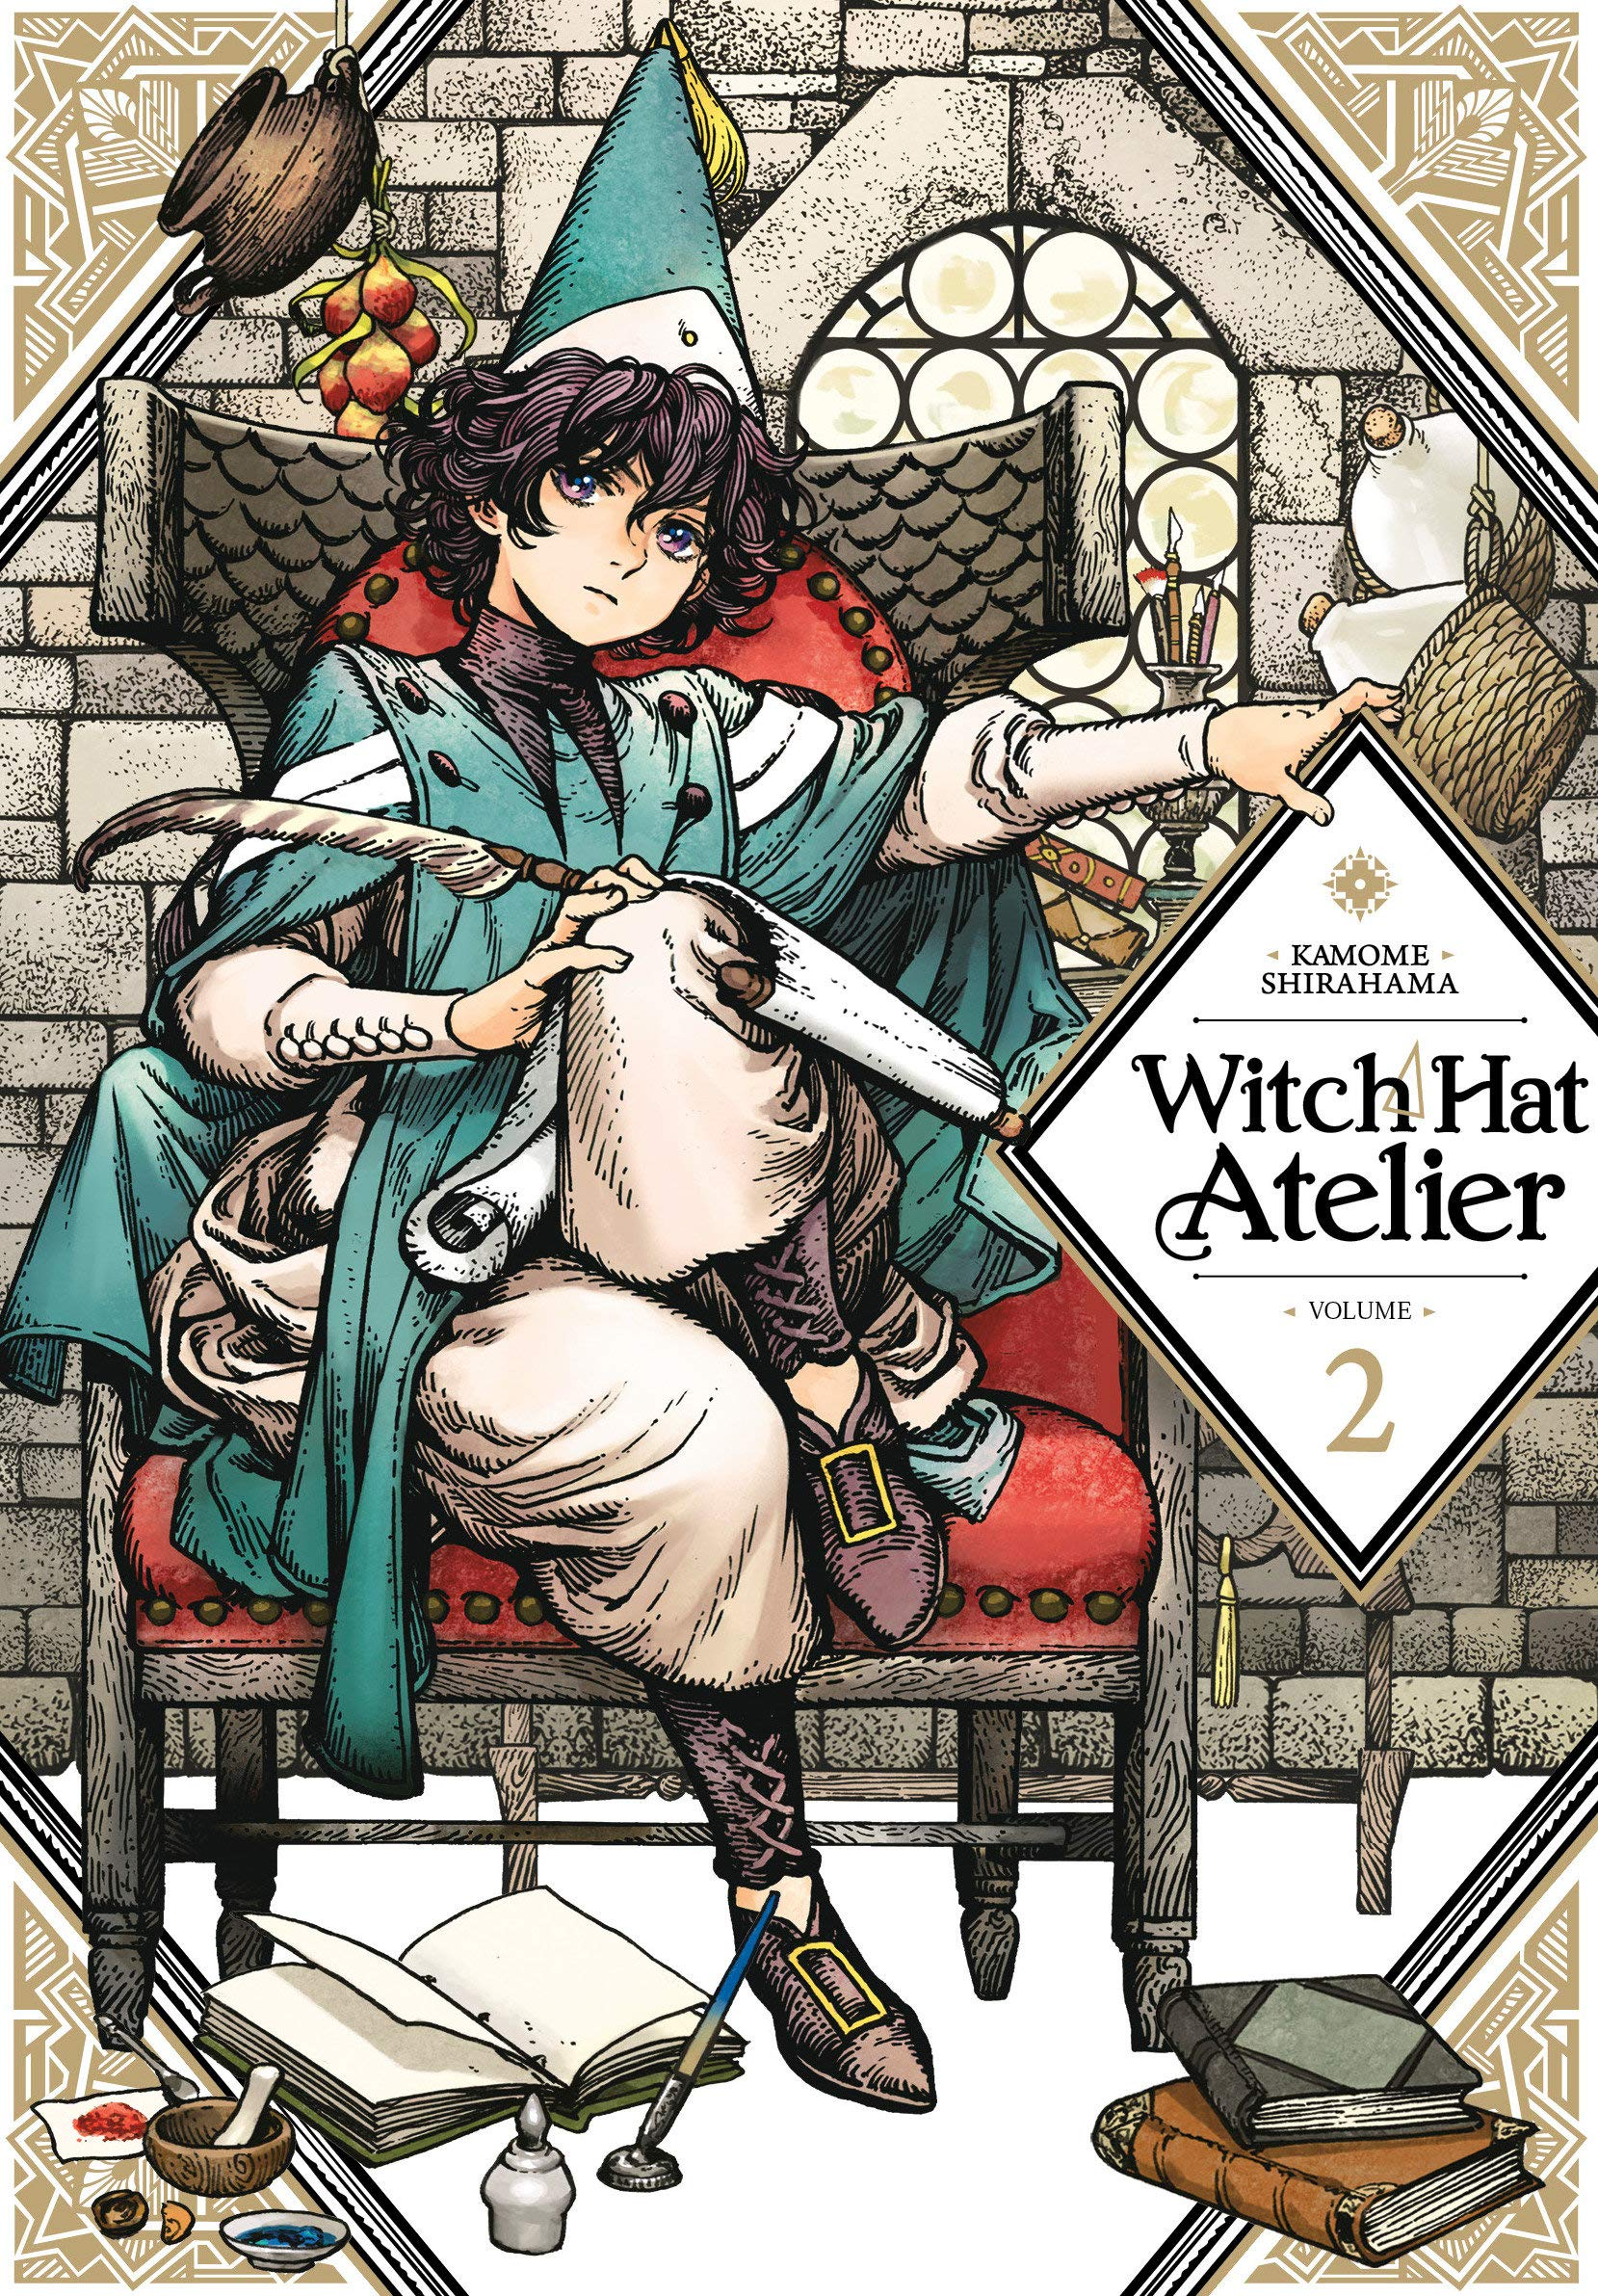 Witch Hat Atelier 2 Shirahama Kamome 9781632368041 Amazon Com Books